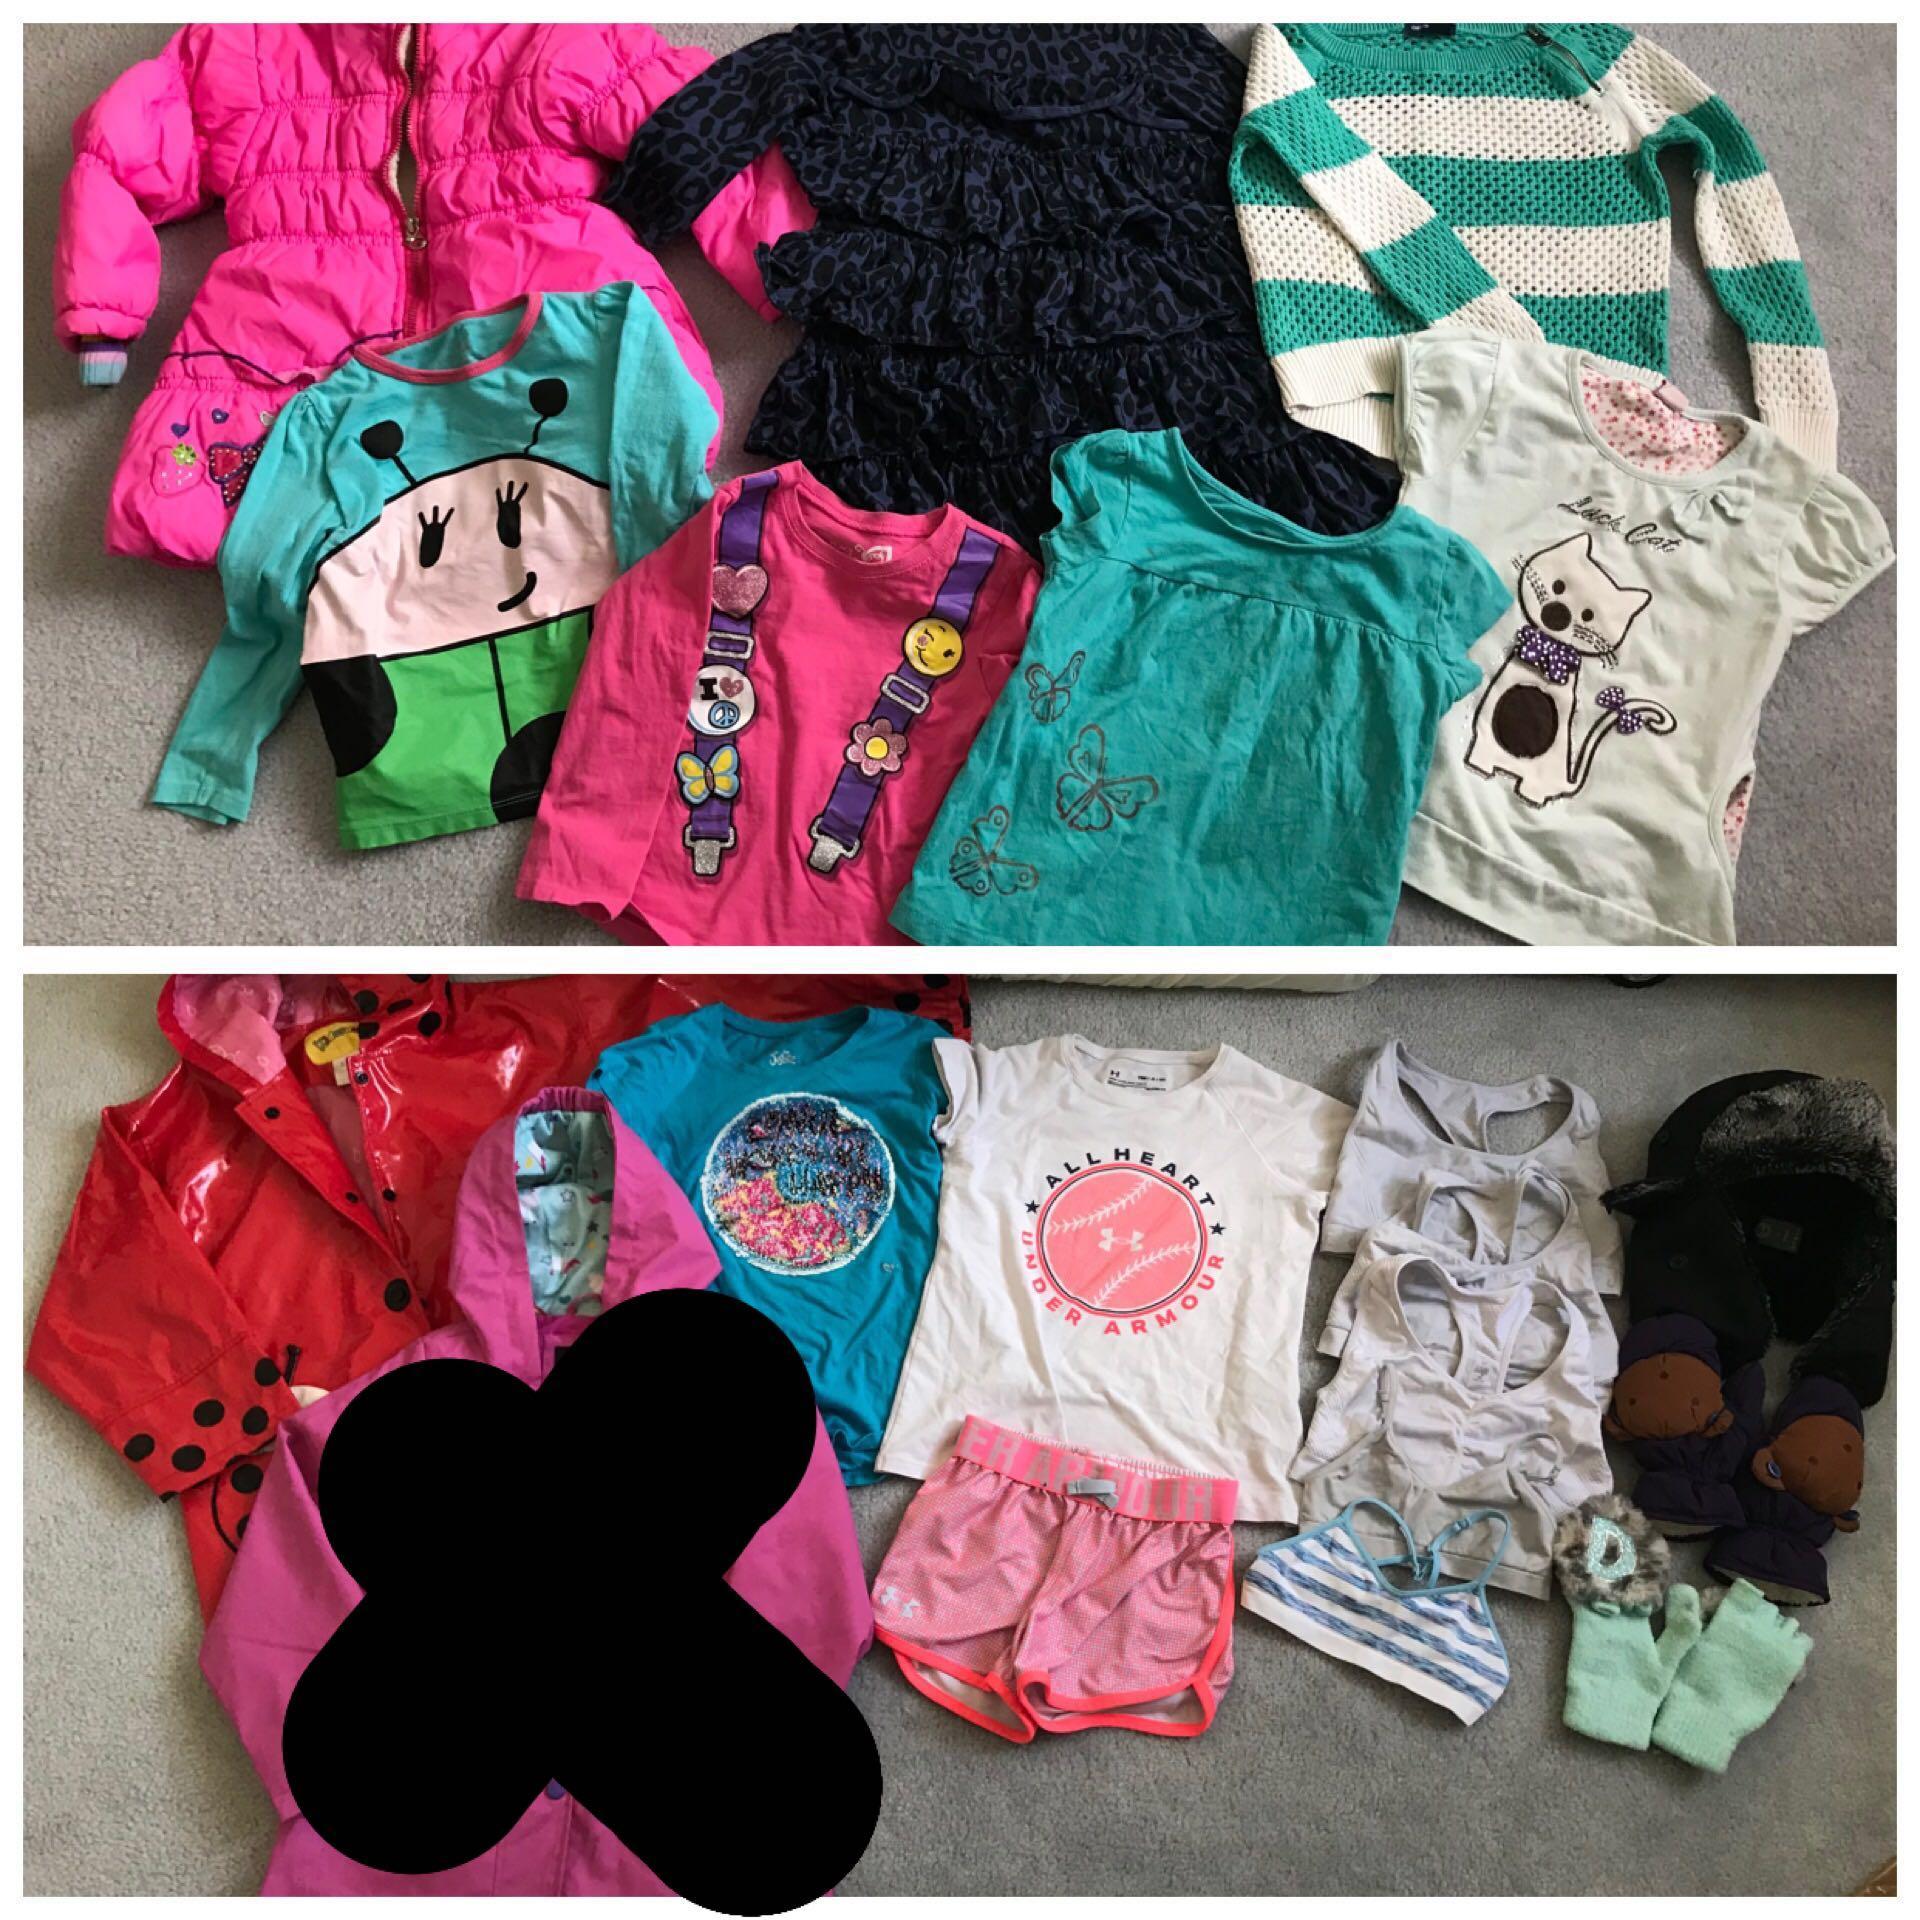 EUC girl raincoat /jacket / clothing lots 4-6T, 6-7T (total 19 items)